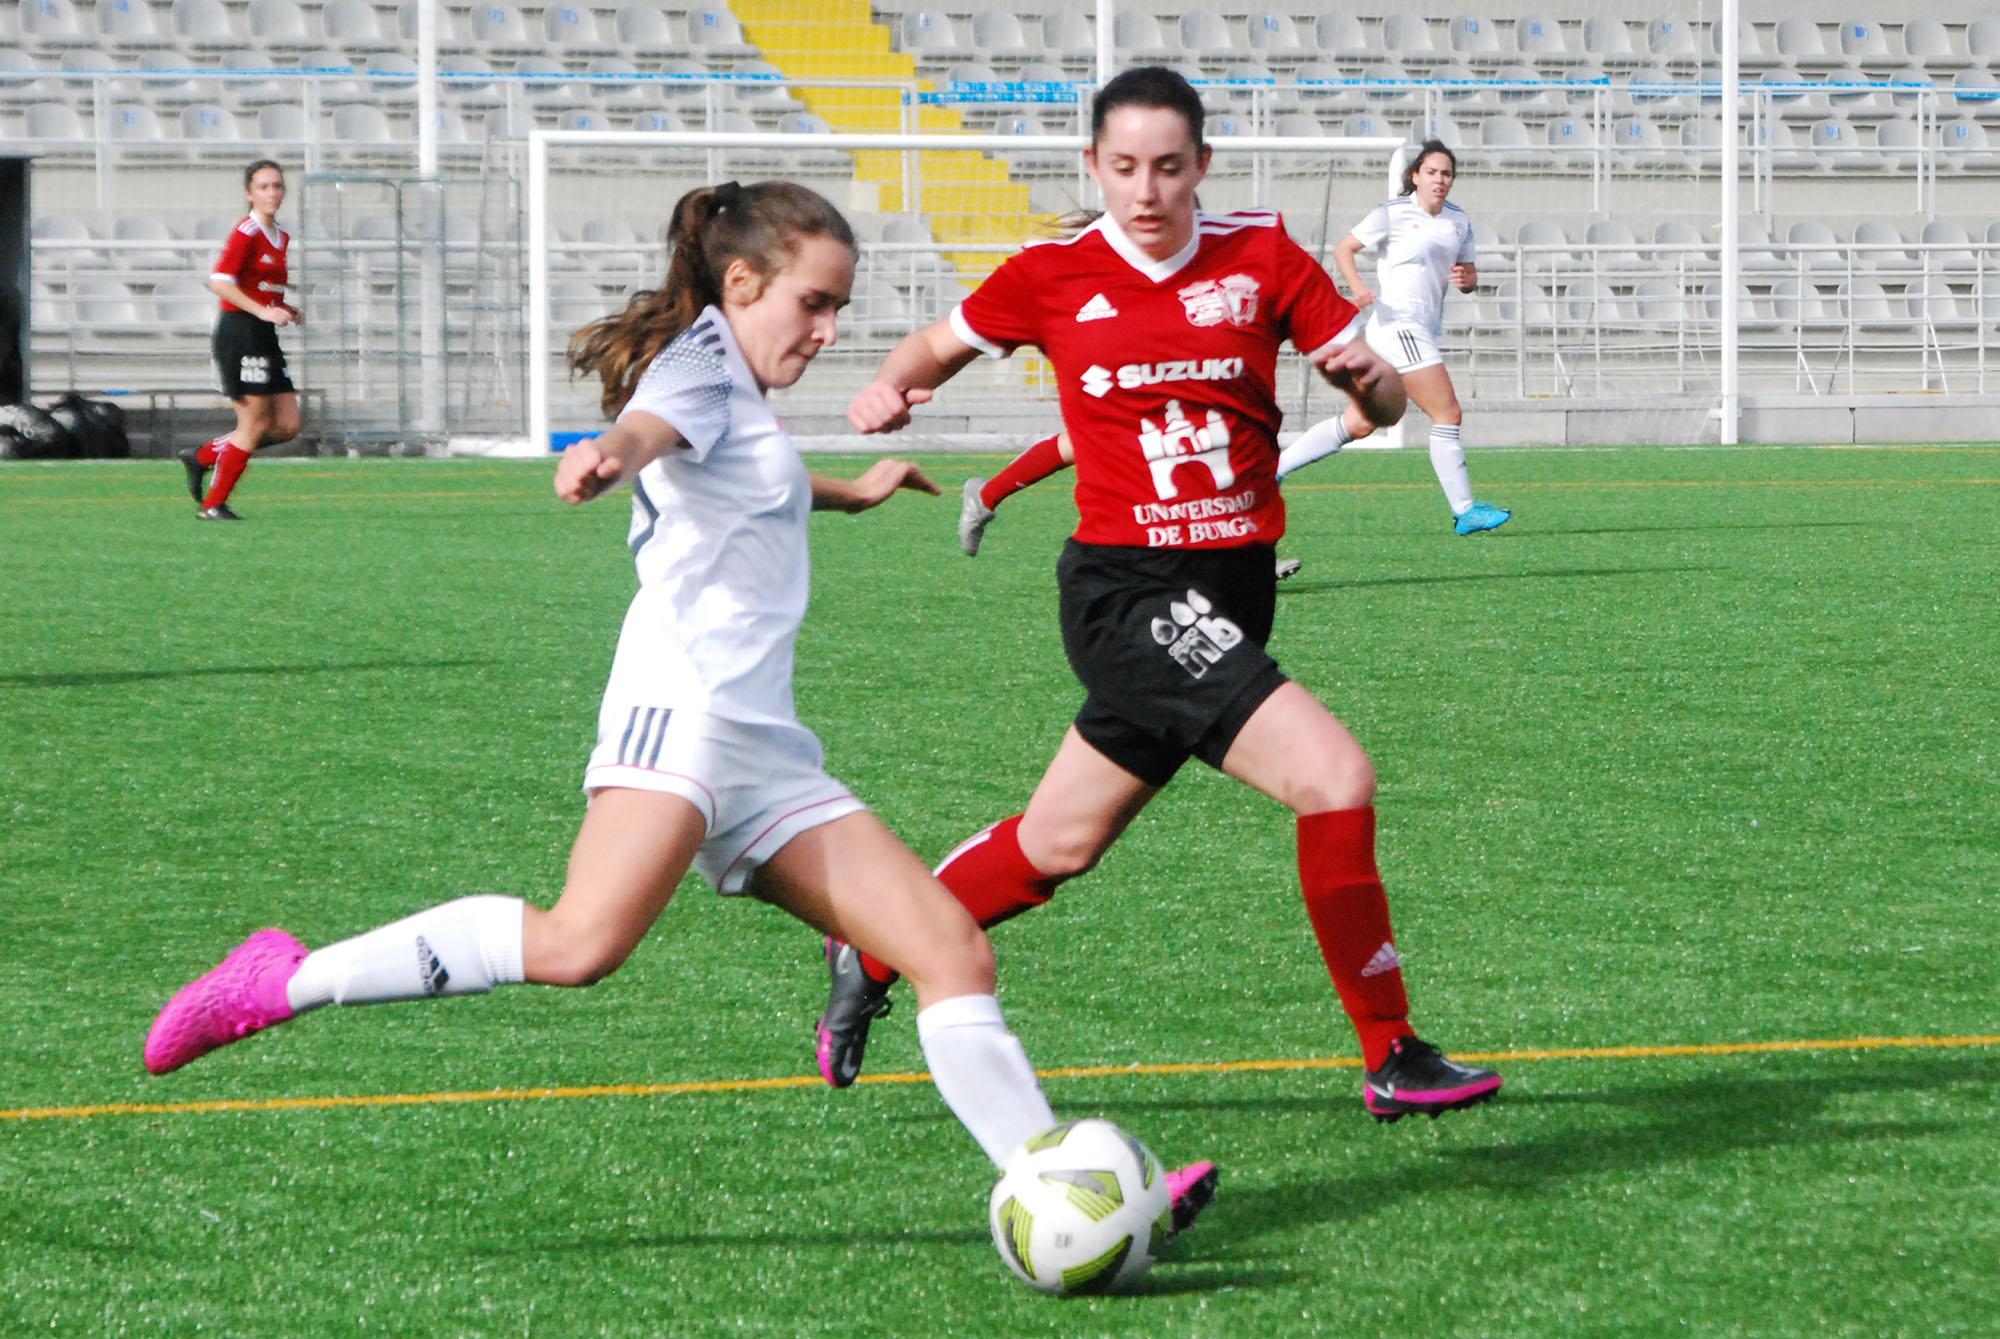 FOTOS / Sara Olmos (RFFM) - Madrid CFF C - N. S. Belén 0-2 (Primera Nacional Femenina - Gr. 5 - Jornada 13)